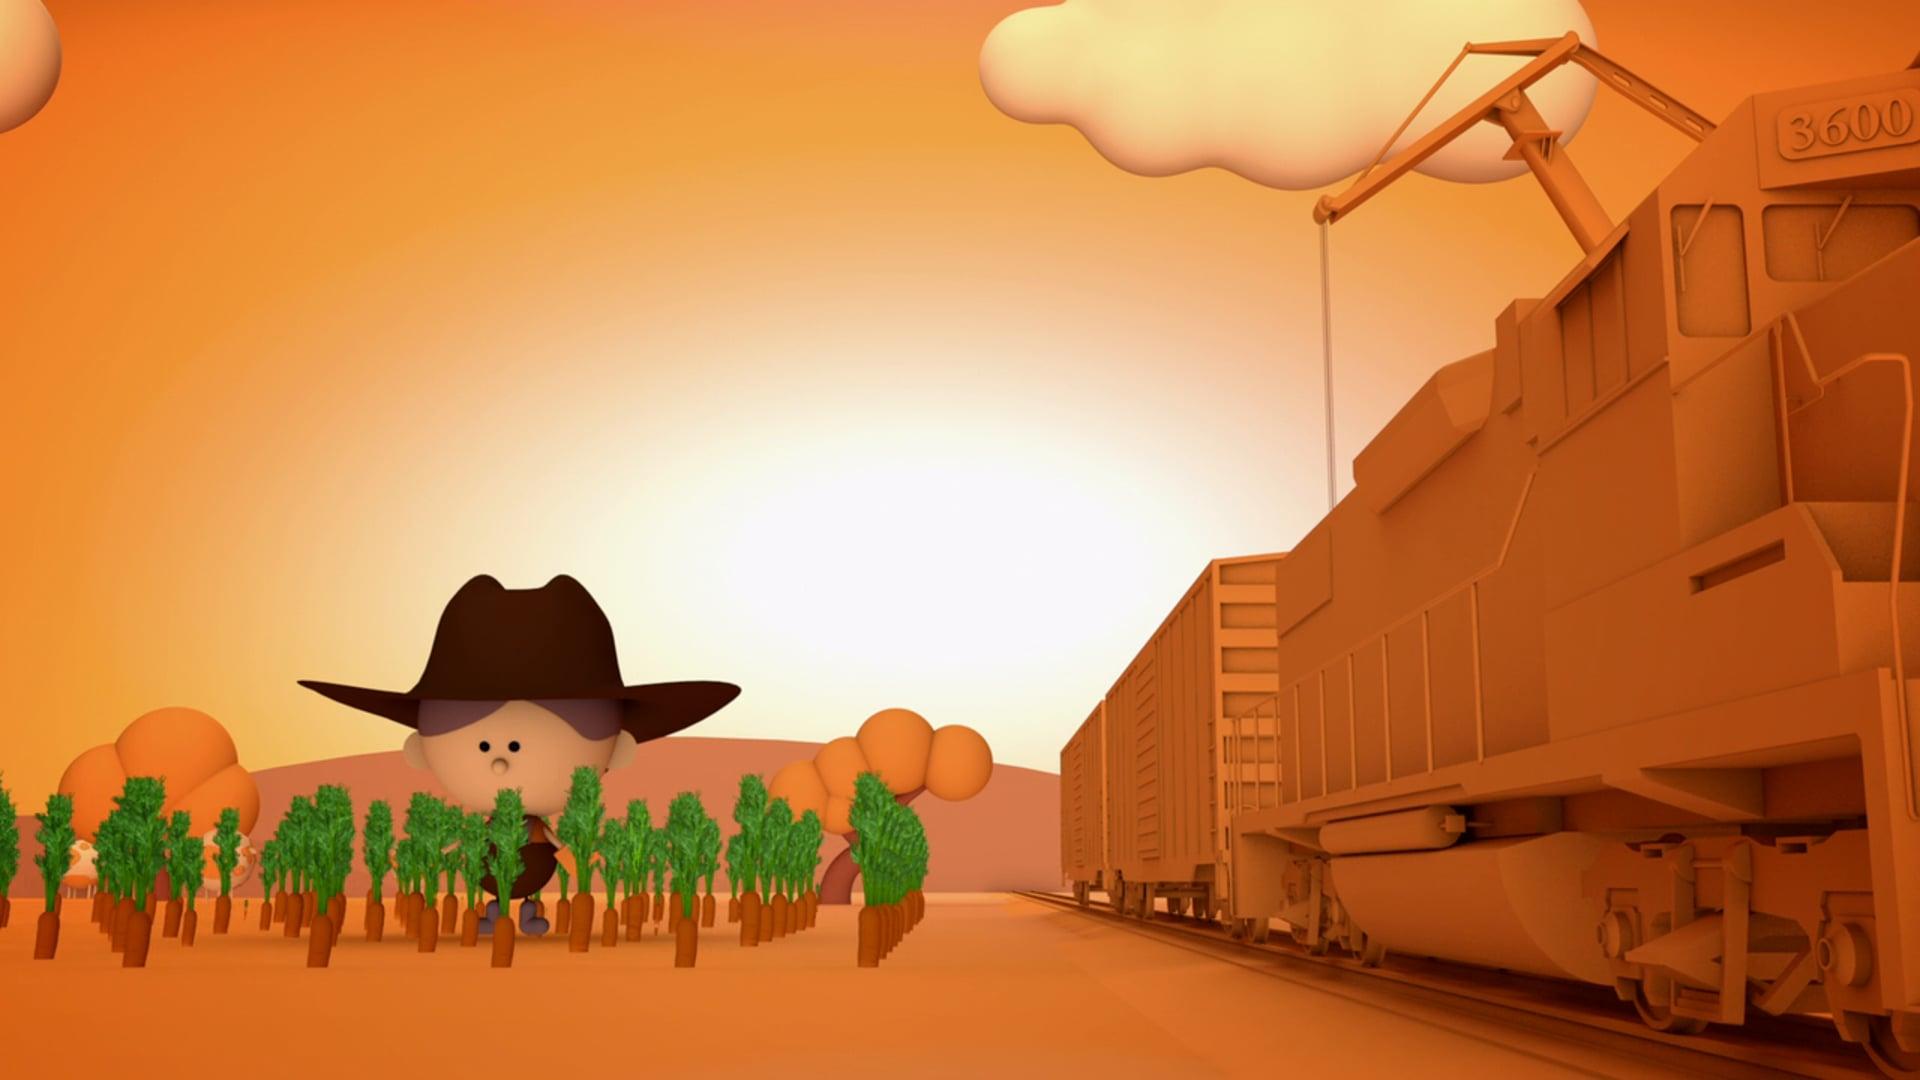 Bolthouse Farms Brand Film. Agency: Goodness Mfg